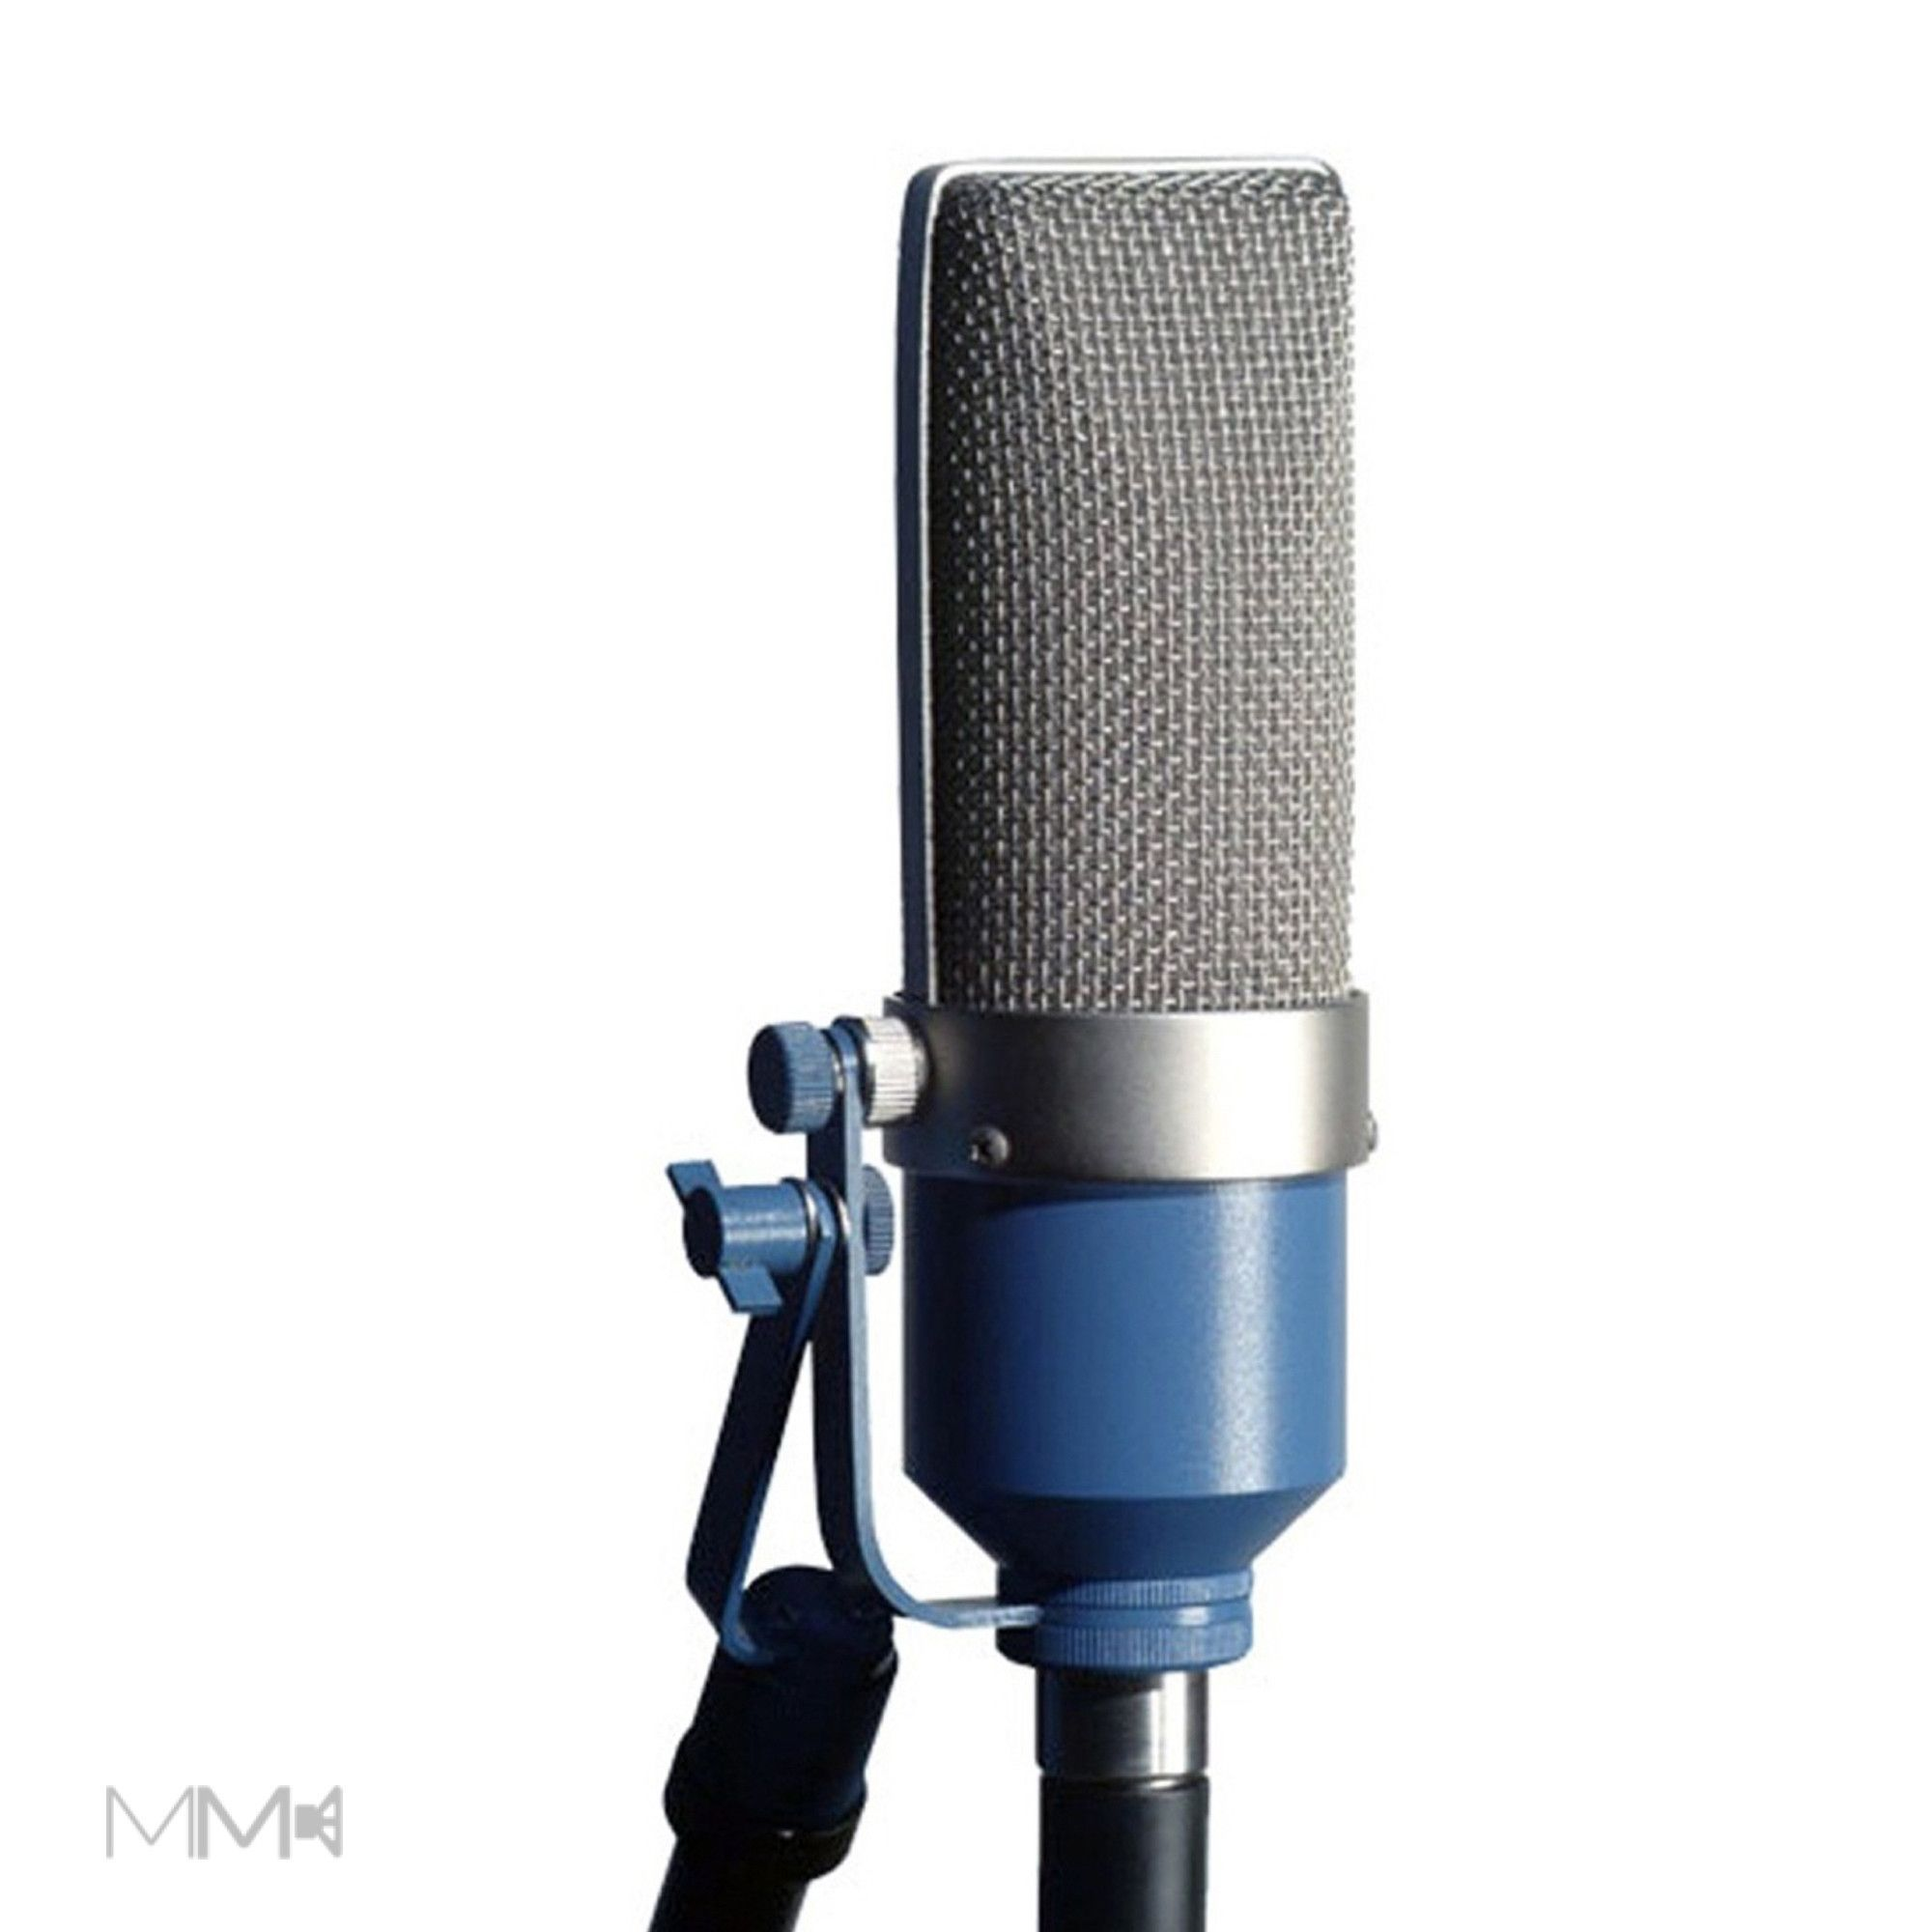 Apex 205 ribbon microphone microfones microfone condensador